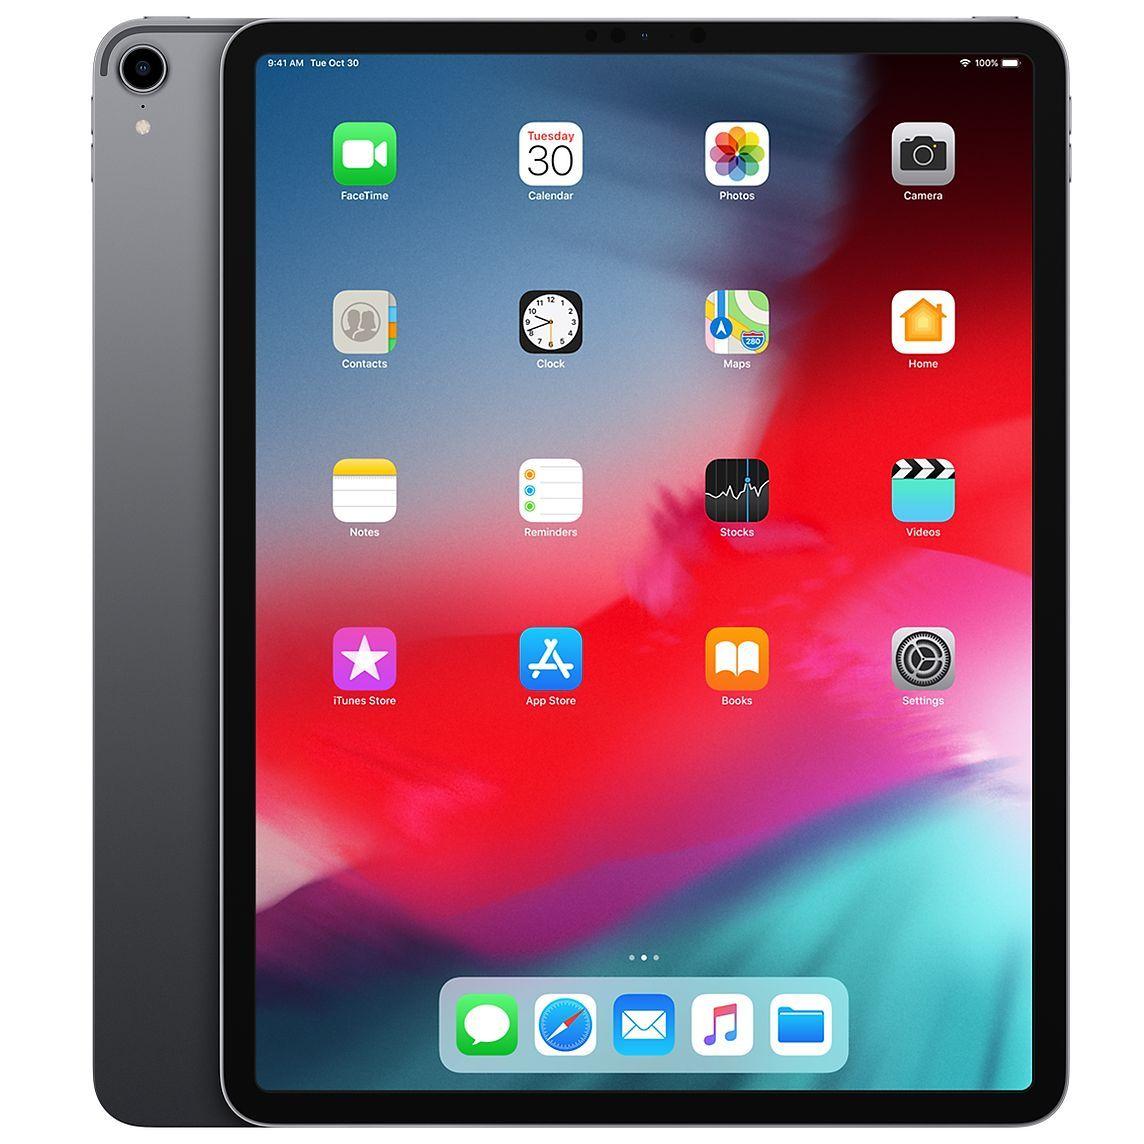 Refurbished 12.9-inch iPad Pro Wi-Fi 64GB - Space Grey (3rd Generation) £679 at Apple Store